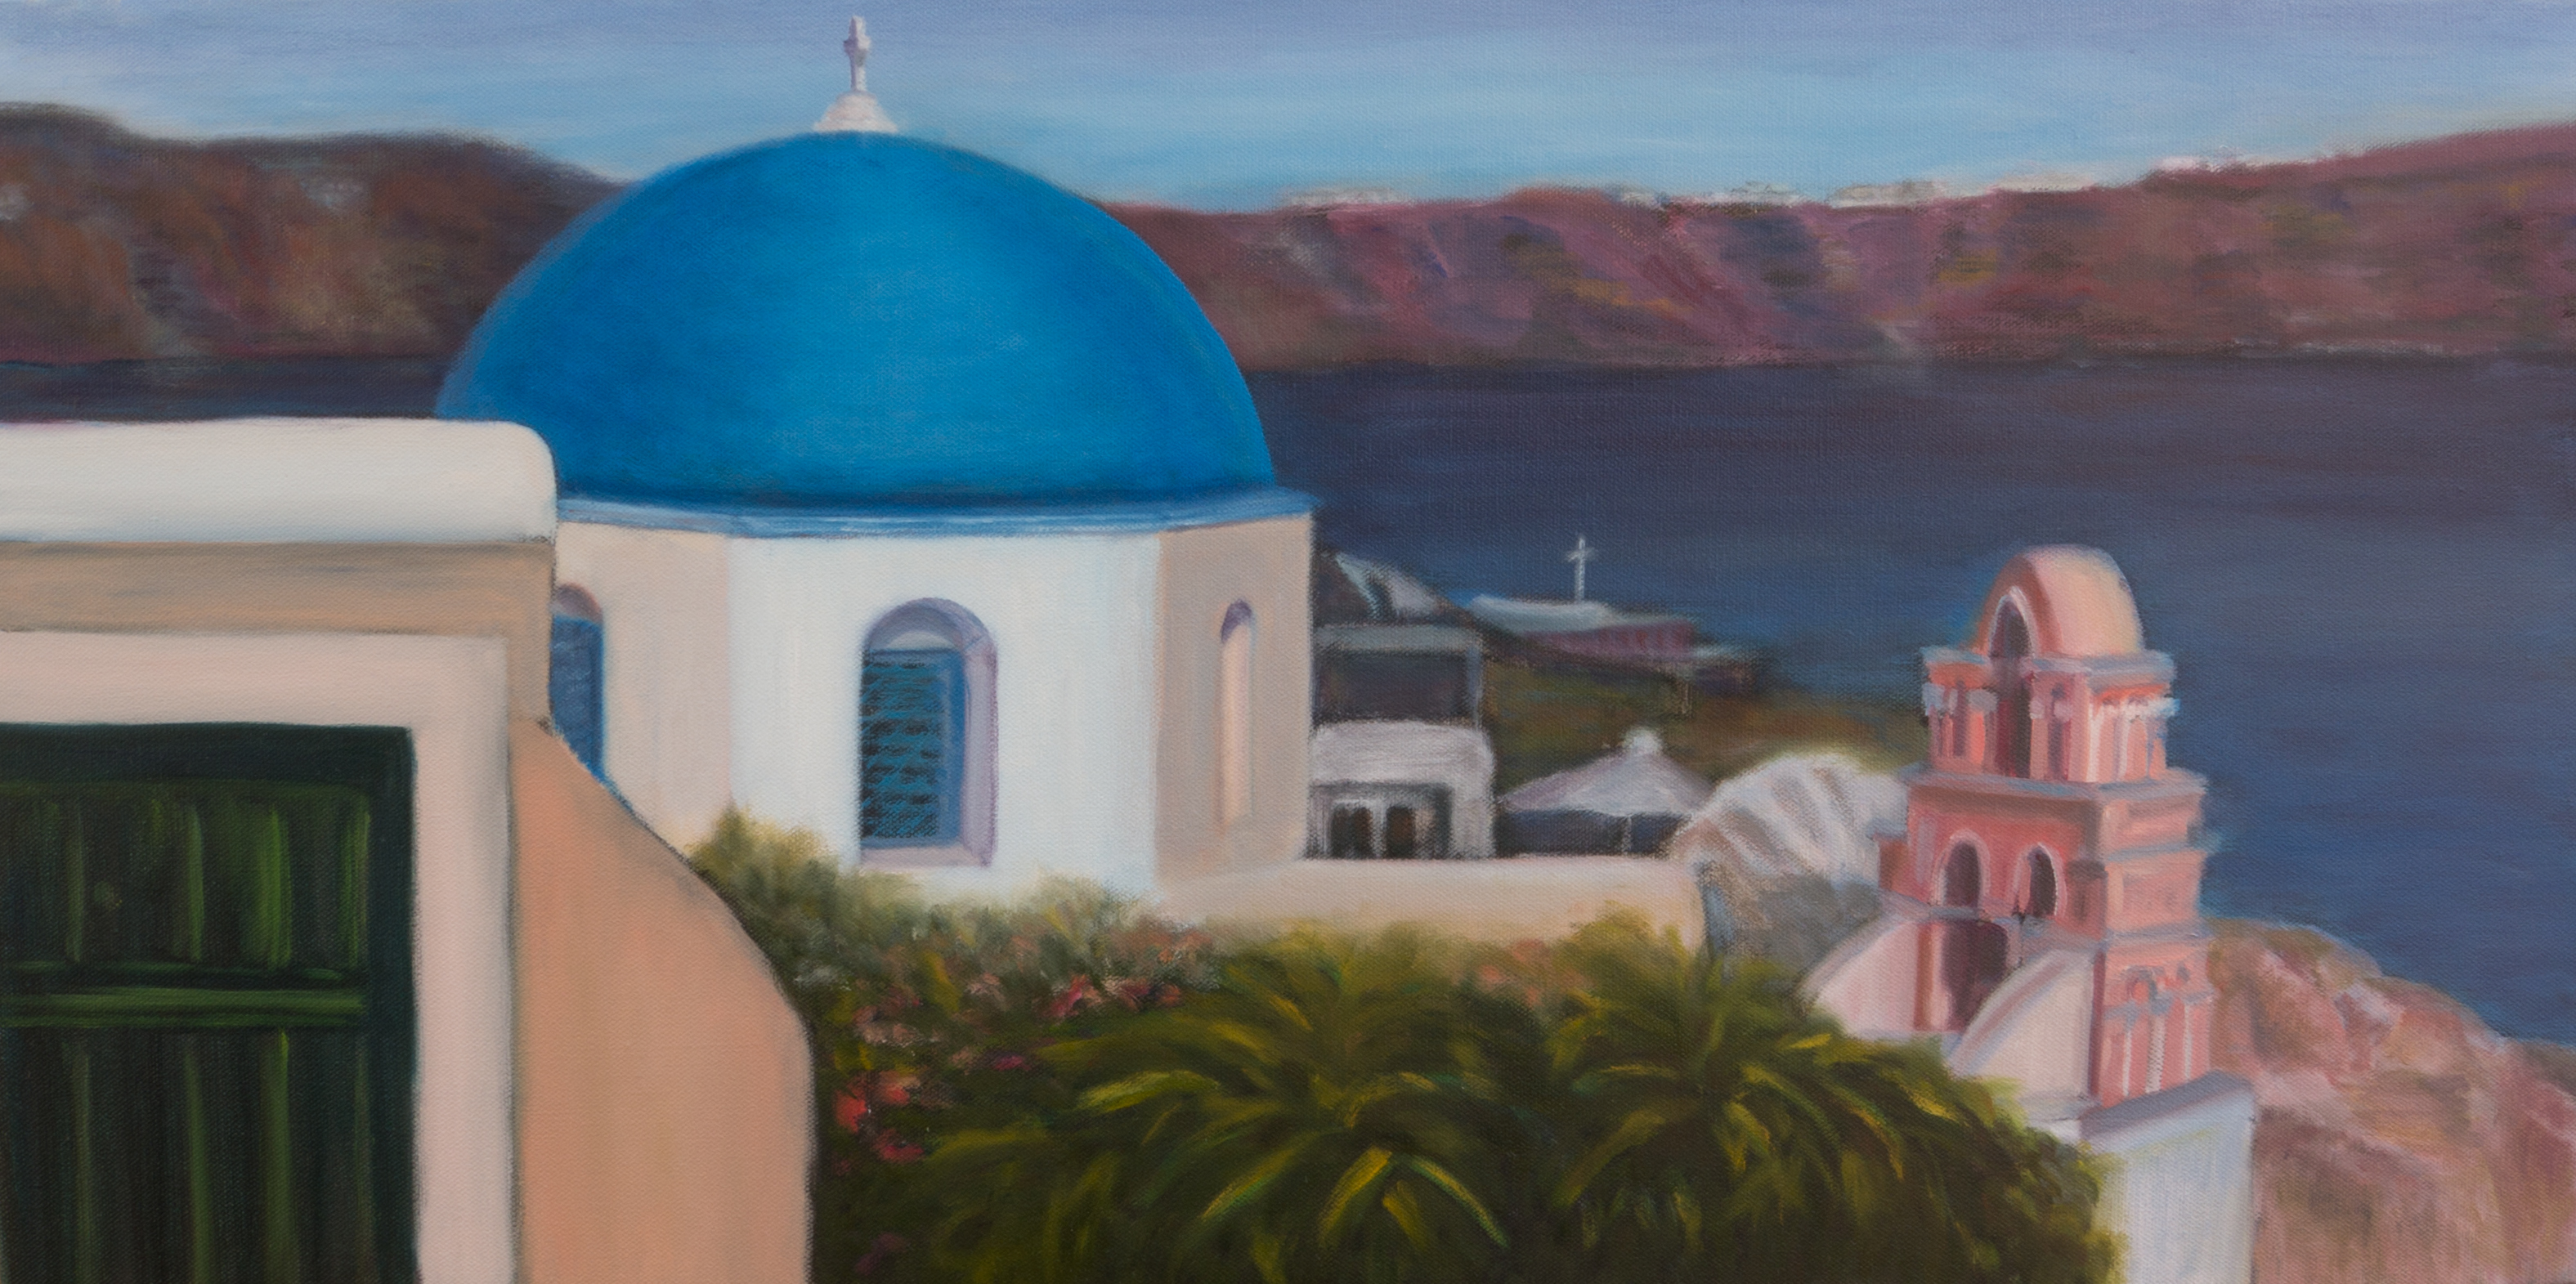 Santorini, a different Perspective